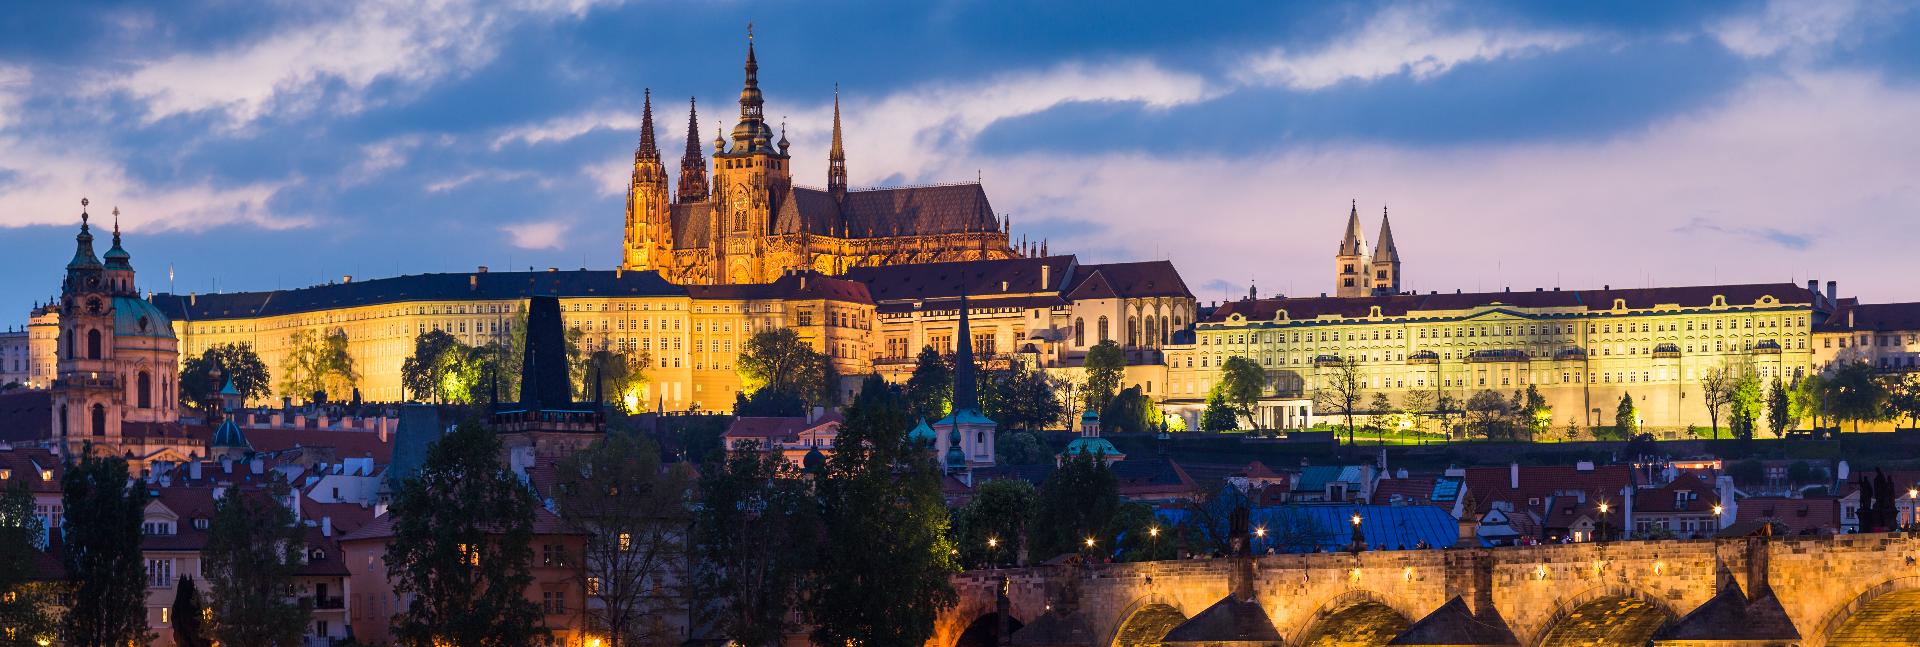 Tour del Castillo Praga - PRG Tours Praga_edited_edited_edited.jpg